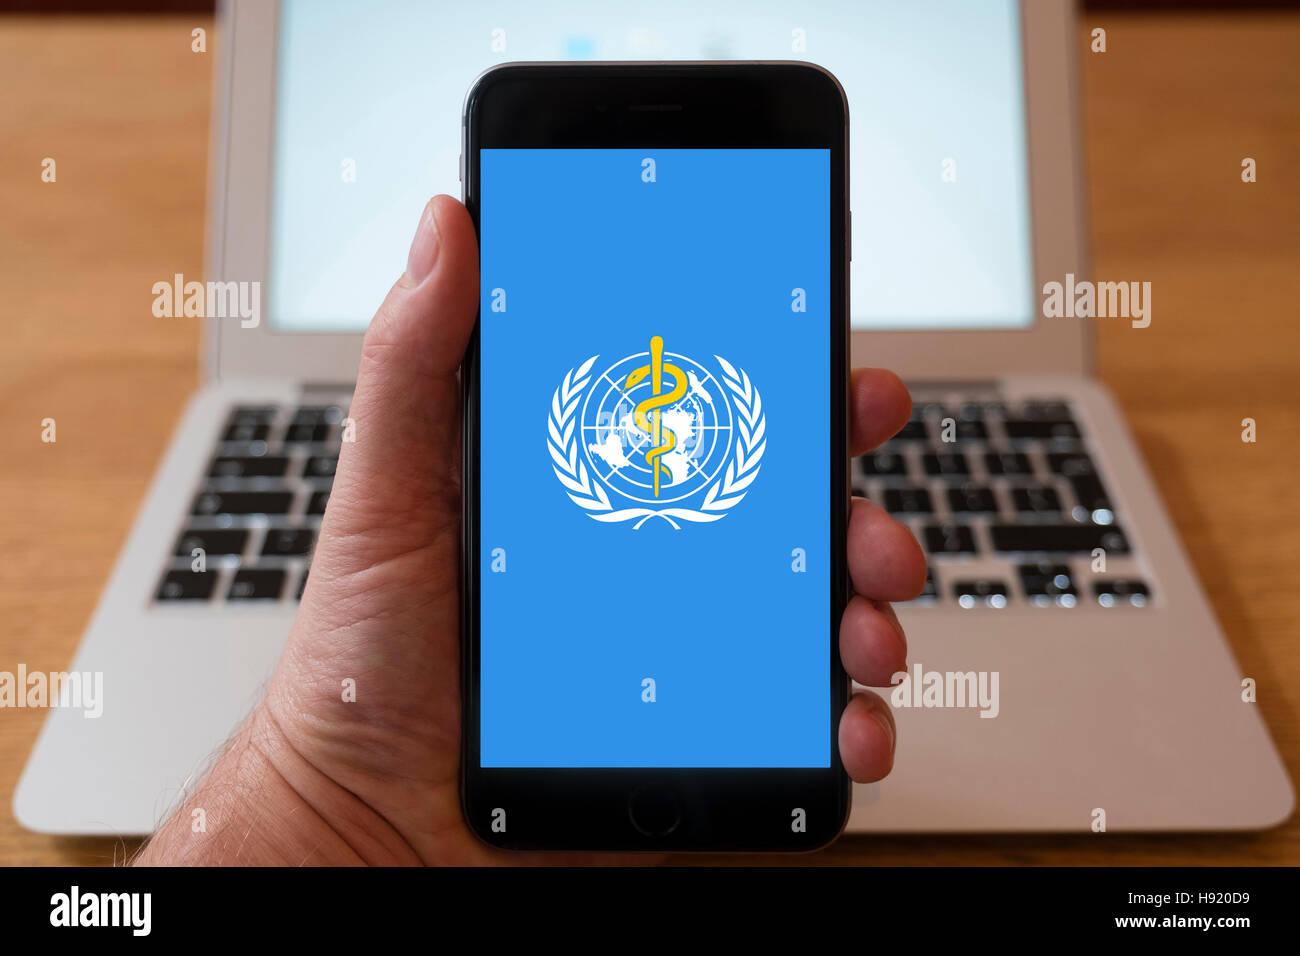 Using iPhone smart phone to display website logo of World Health Organisation - Stock Image